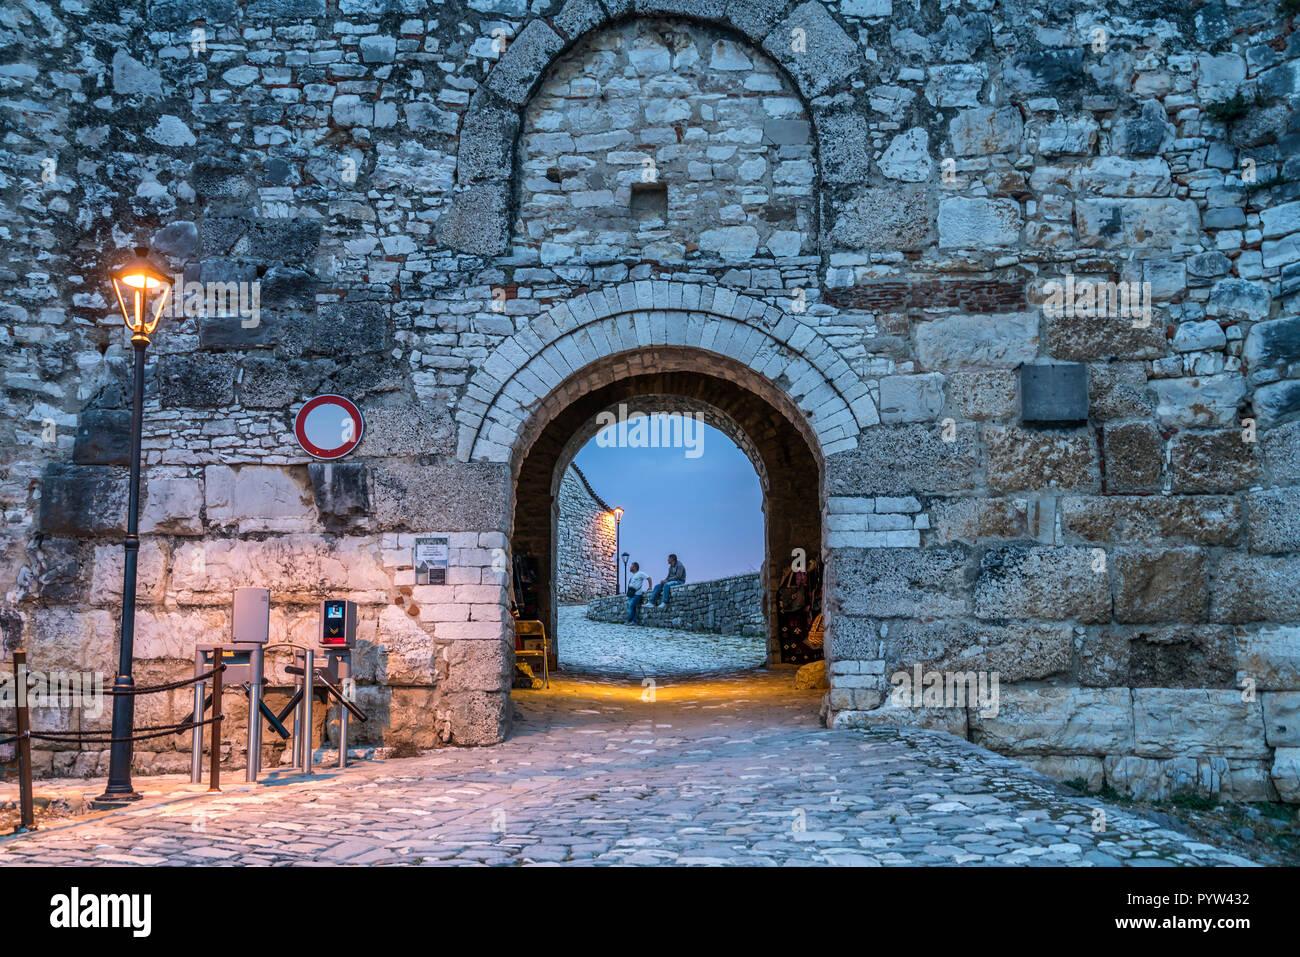 Eingang zur Burgfestung in der Abenddämmerung, Berat, Albanien, Europa |   entrance to Berat Castle at dusk,  Berat, Albania, Europe - Stock Image